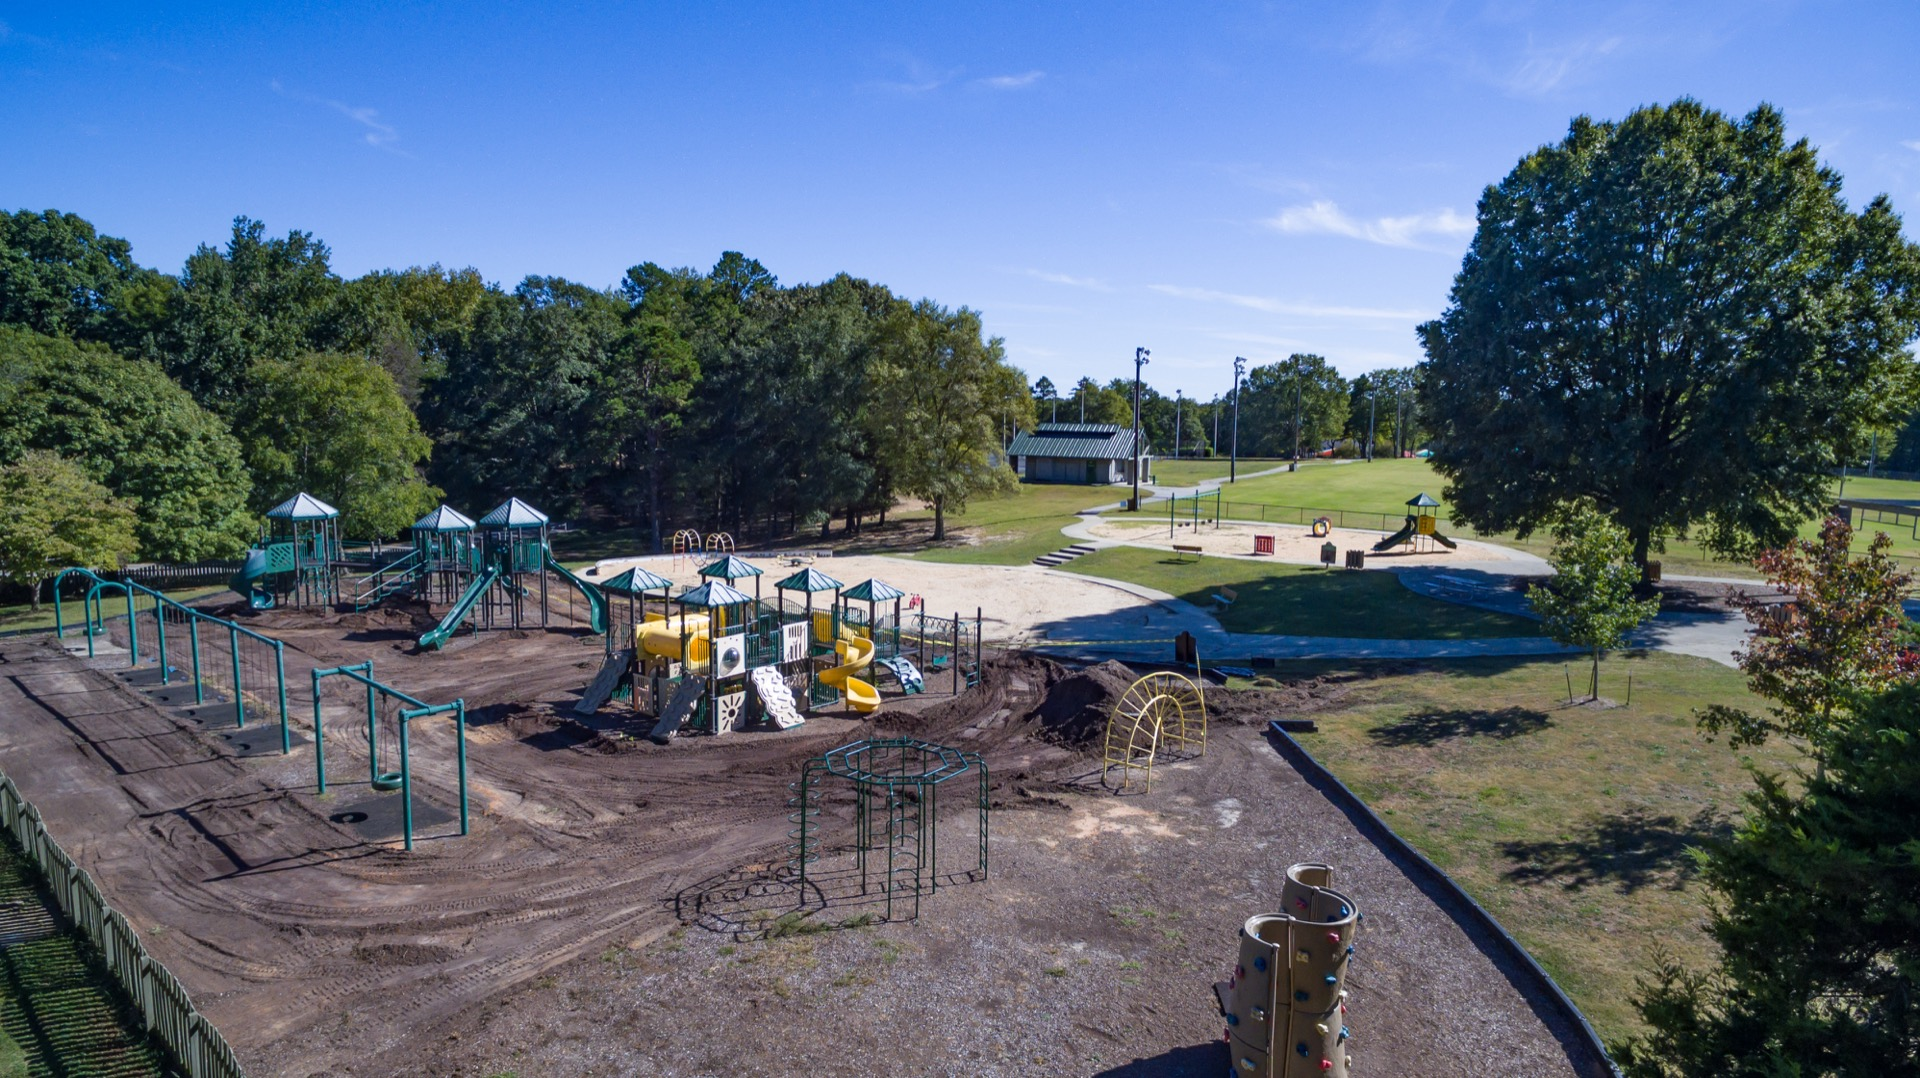 southside park aerial view